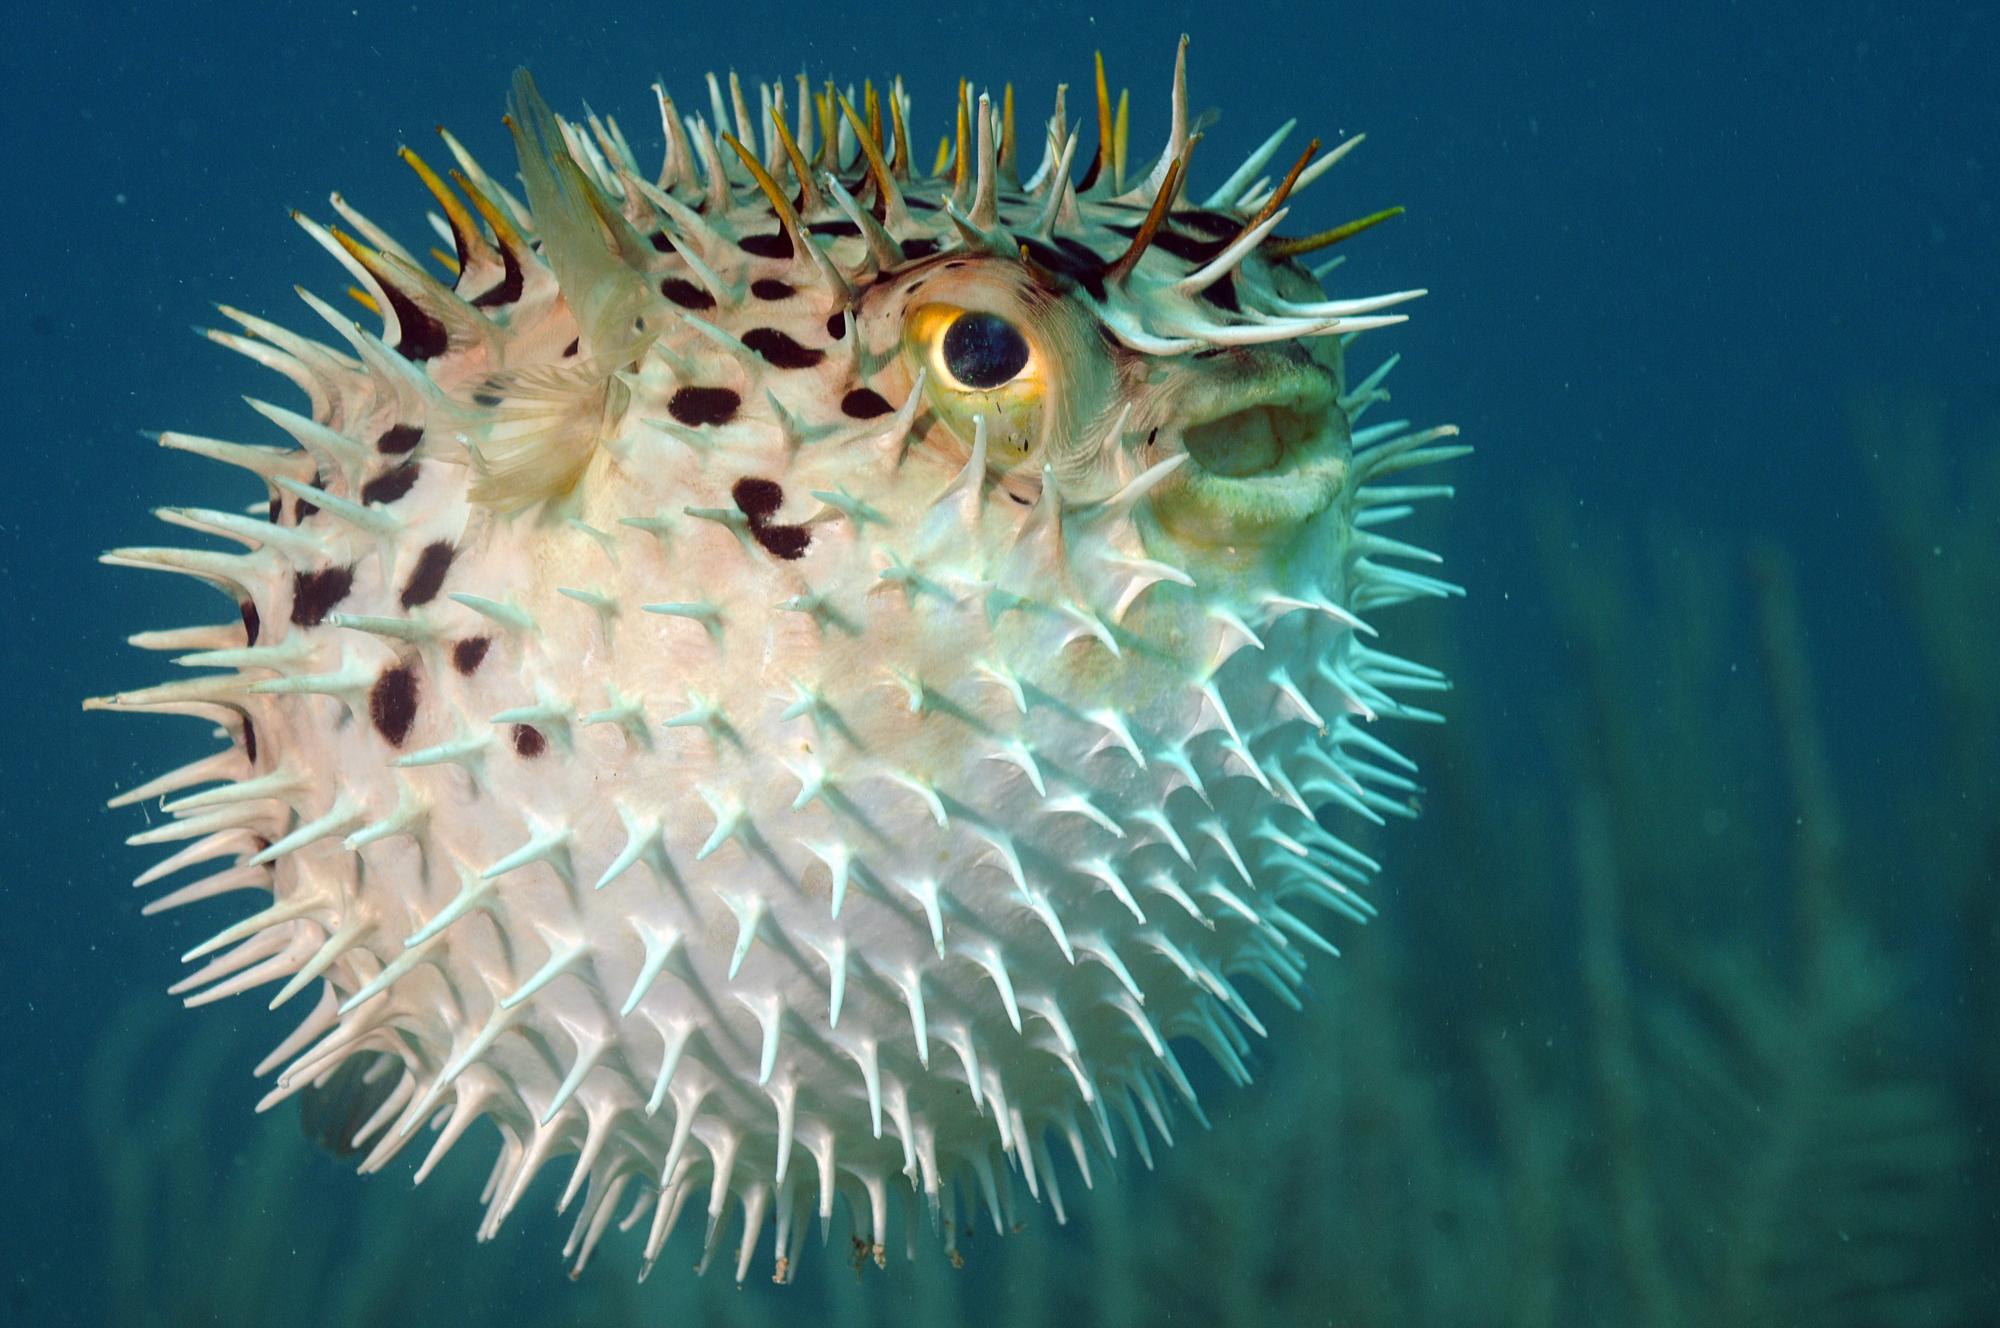 Poisson gonfleur - diodon - poisson-globe - 72ppi